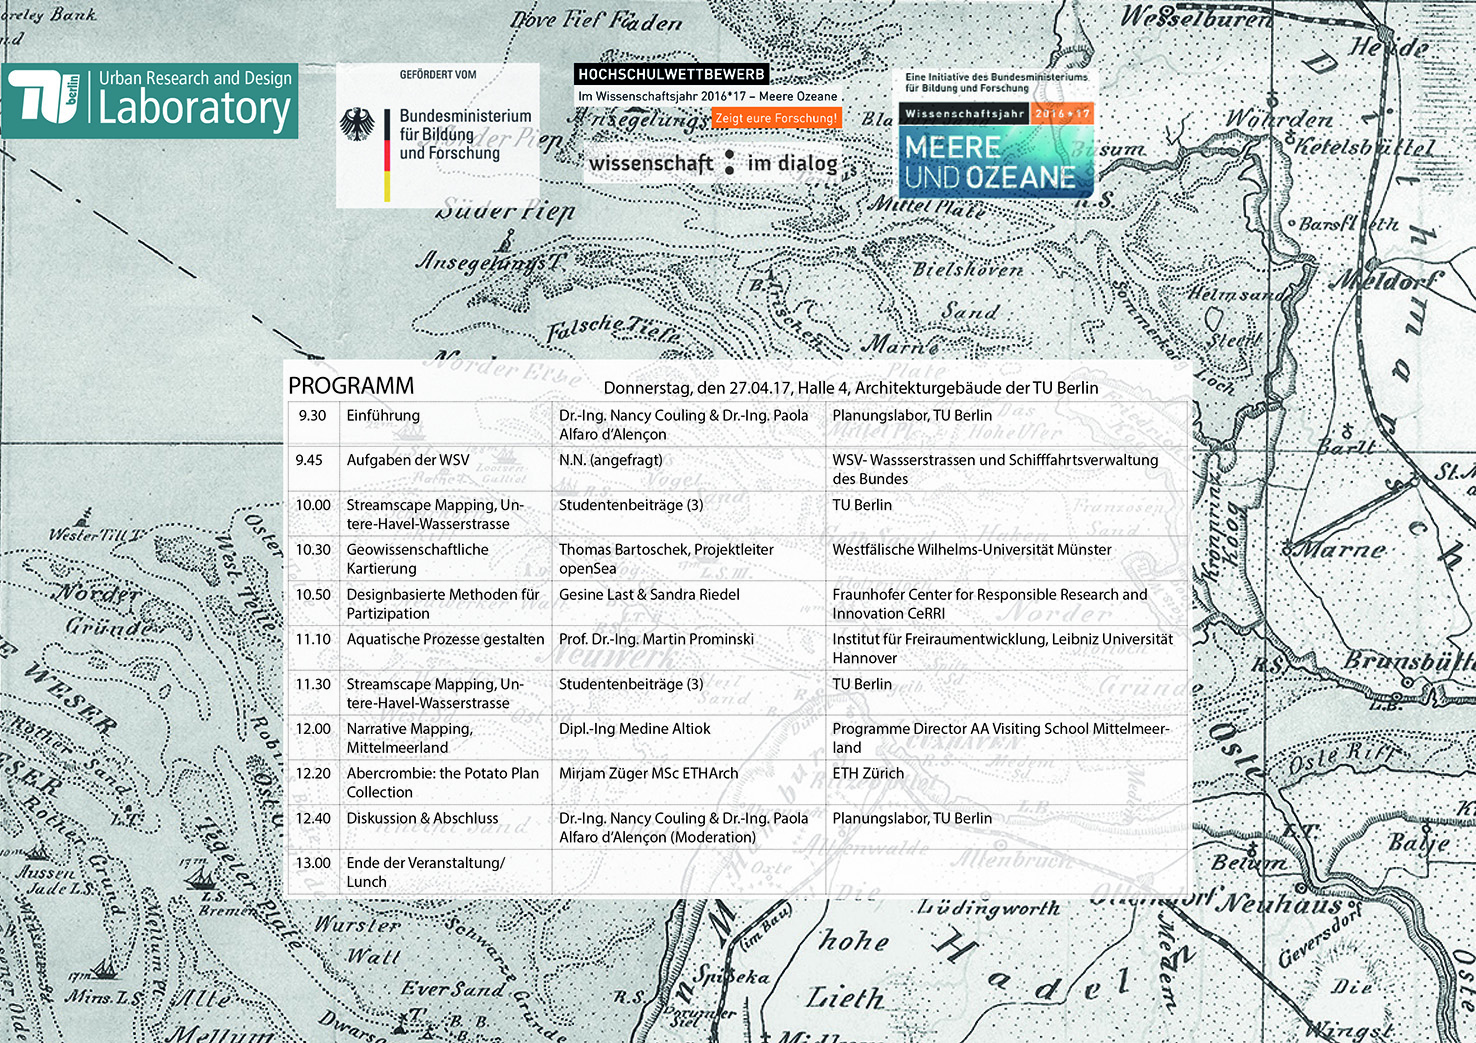 Am 27.04. fand das interdisziplinäre Learning Dialogue im Architekturgebäude der TU Berlin statt.